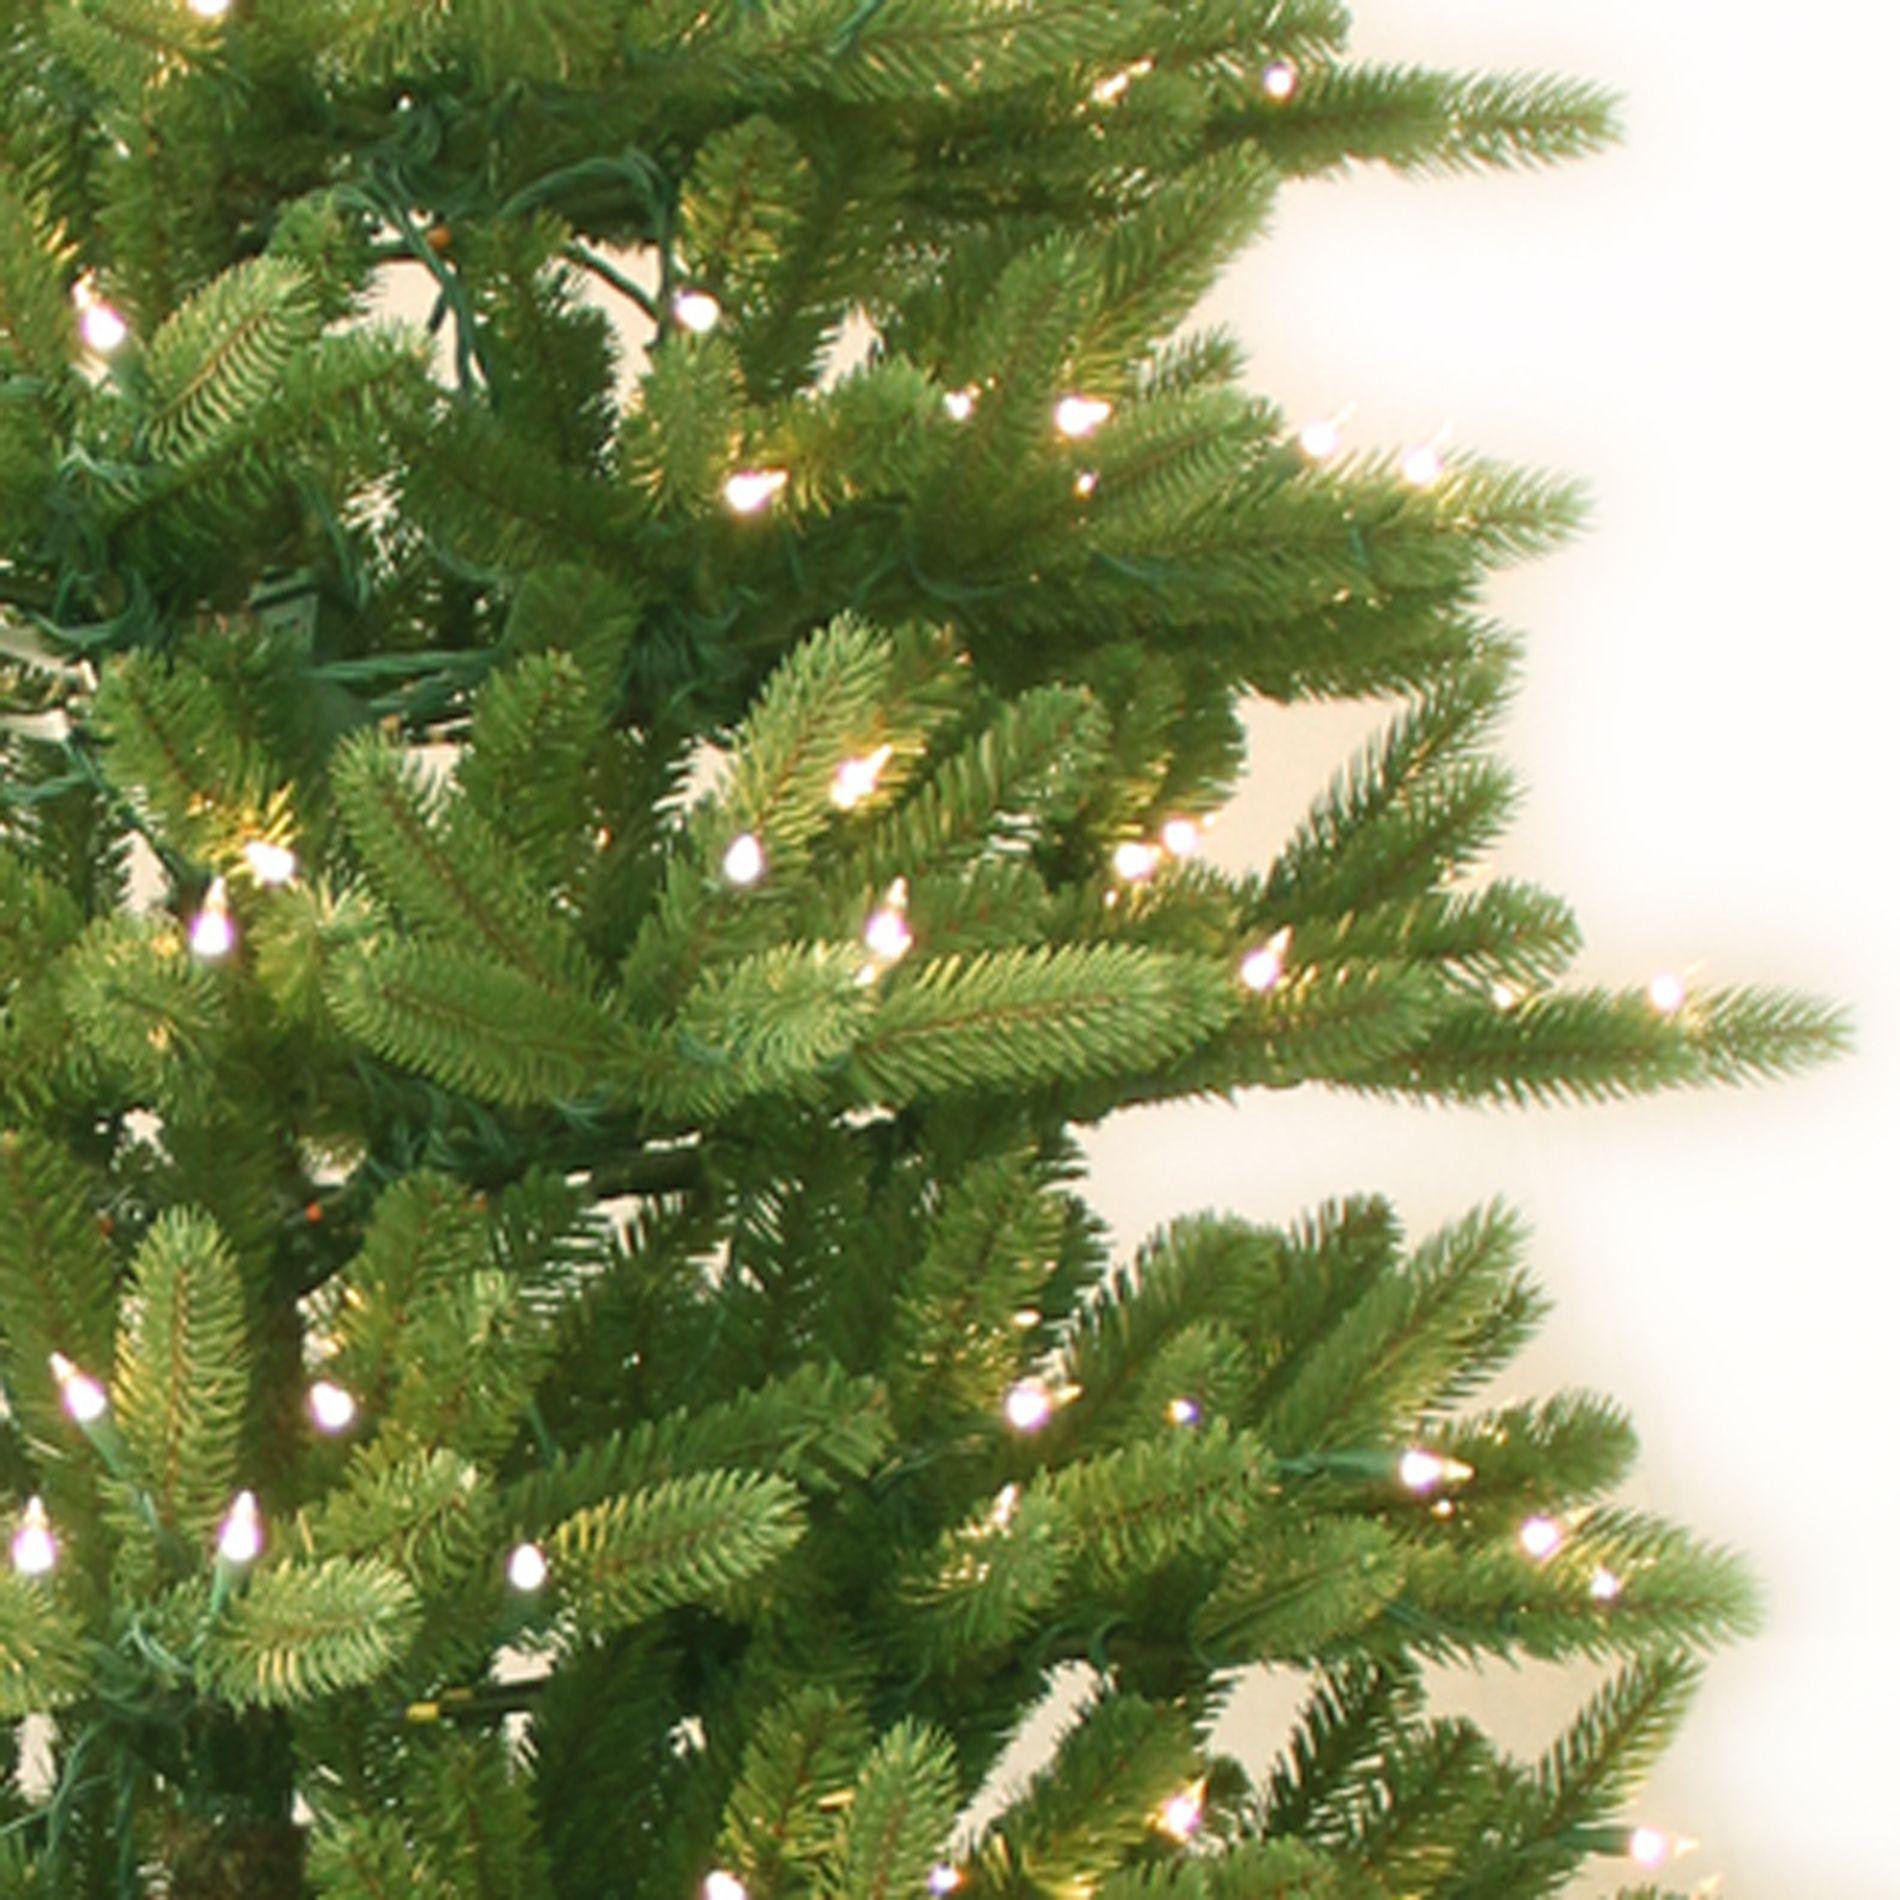 GE 7.5 Ft Clear Pre-Lit Just Cut Natural Frasier Fir Slim Artificial Christmas Tree